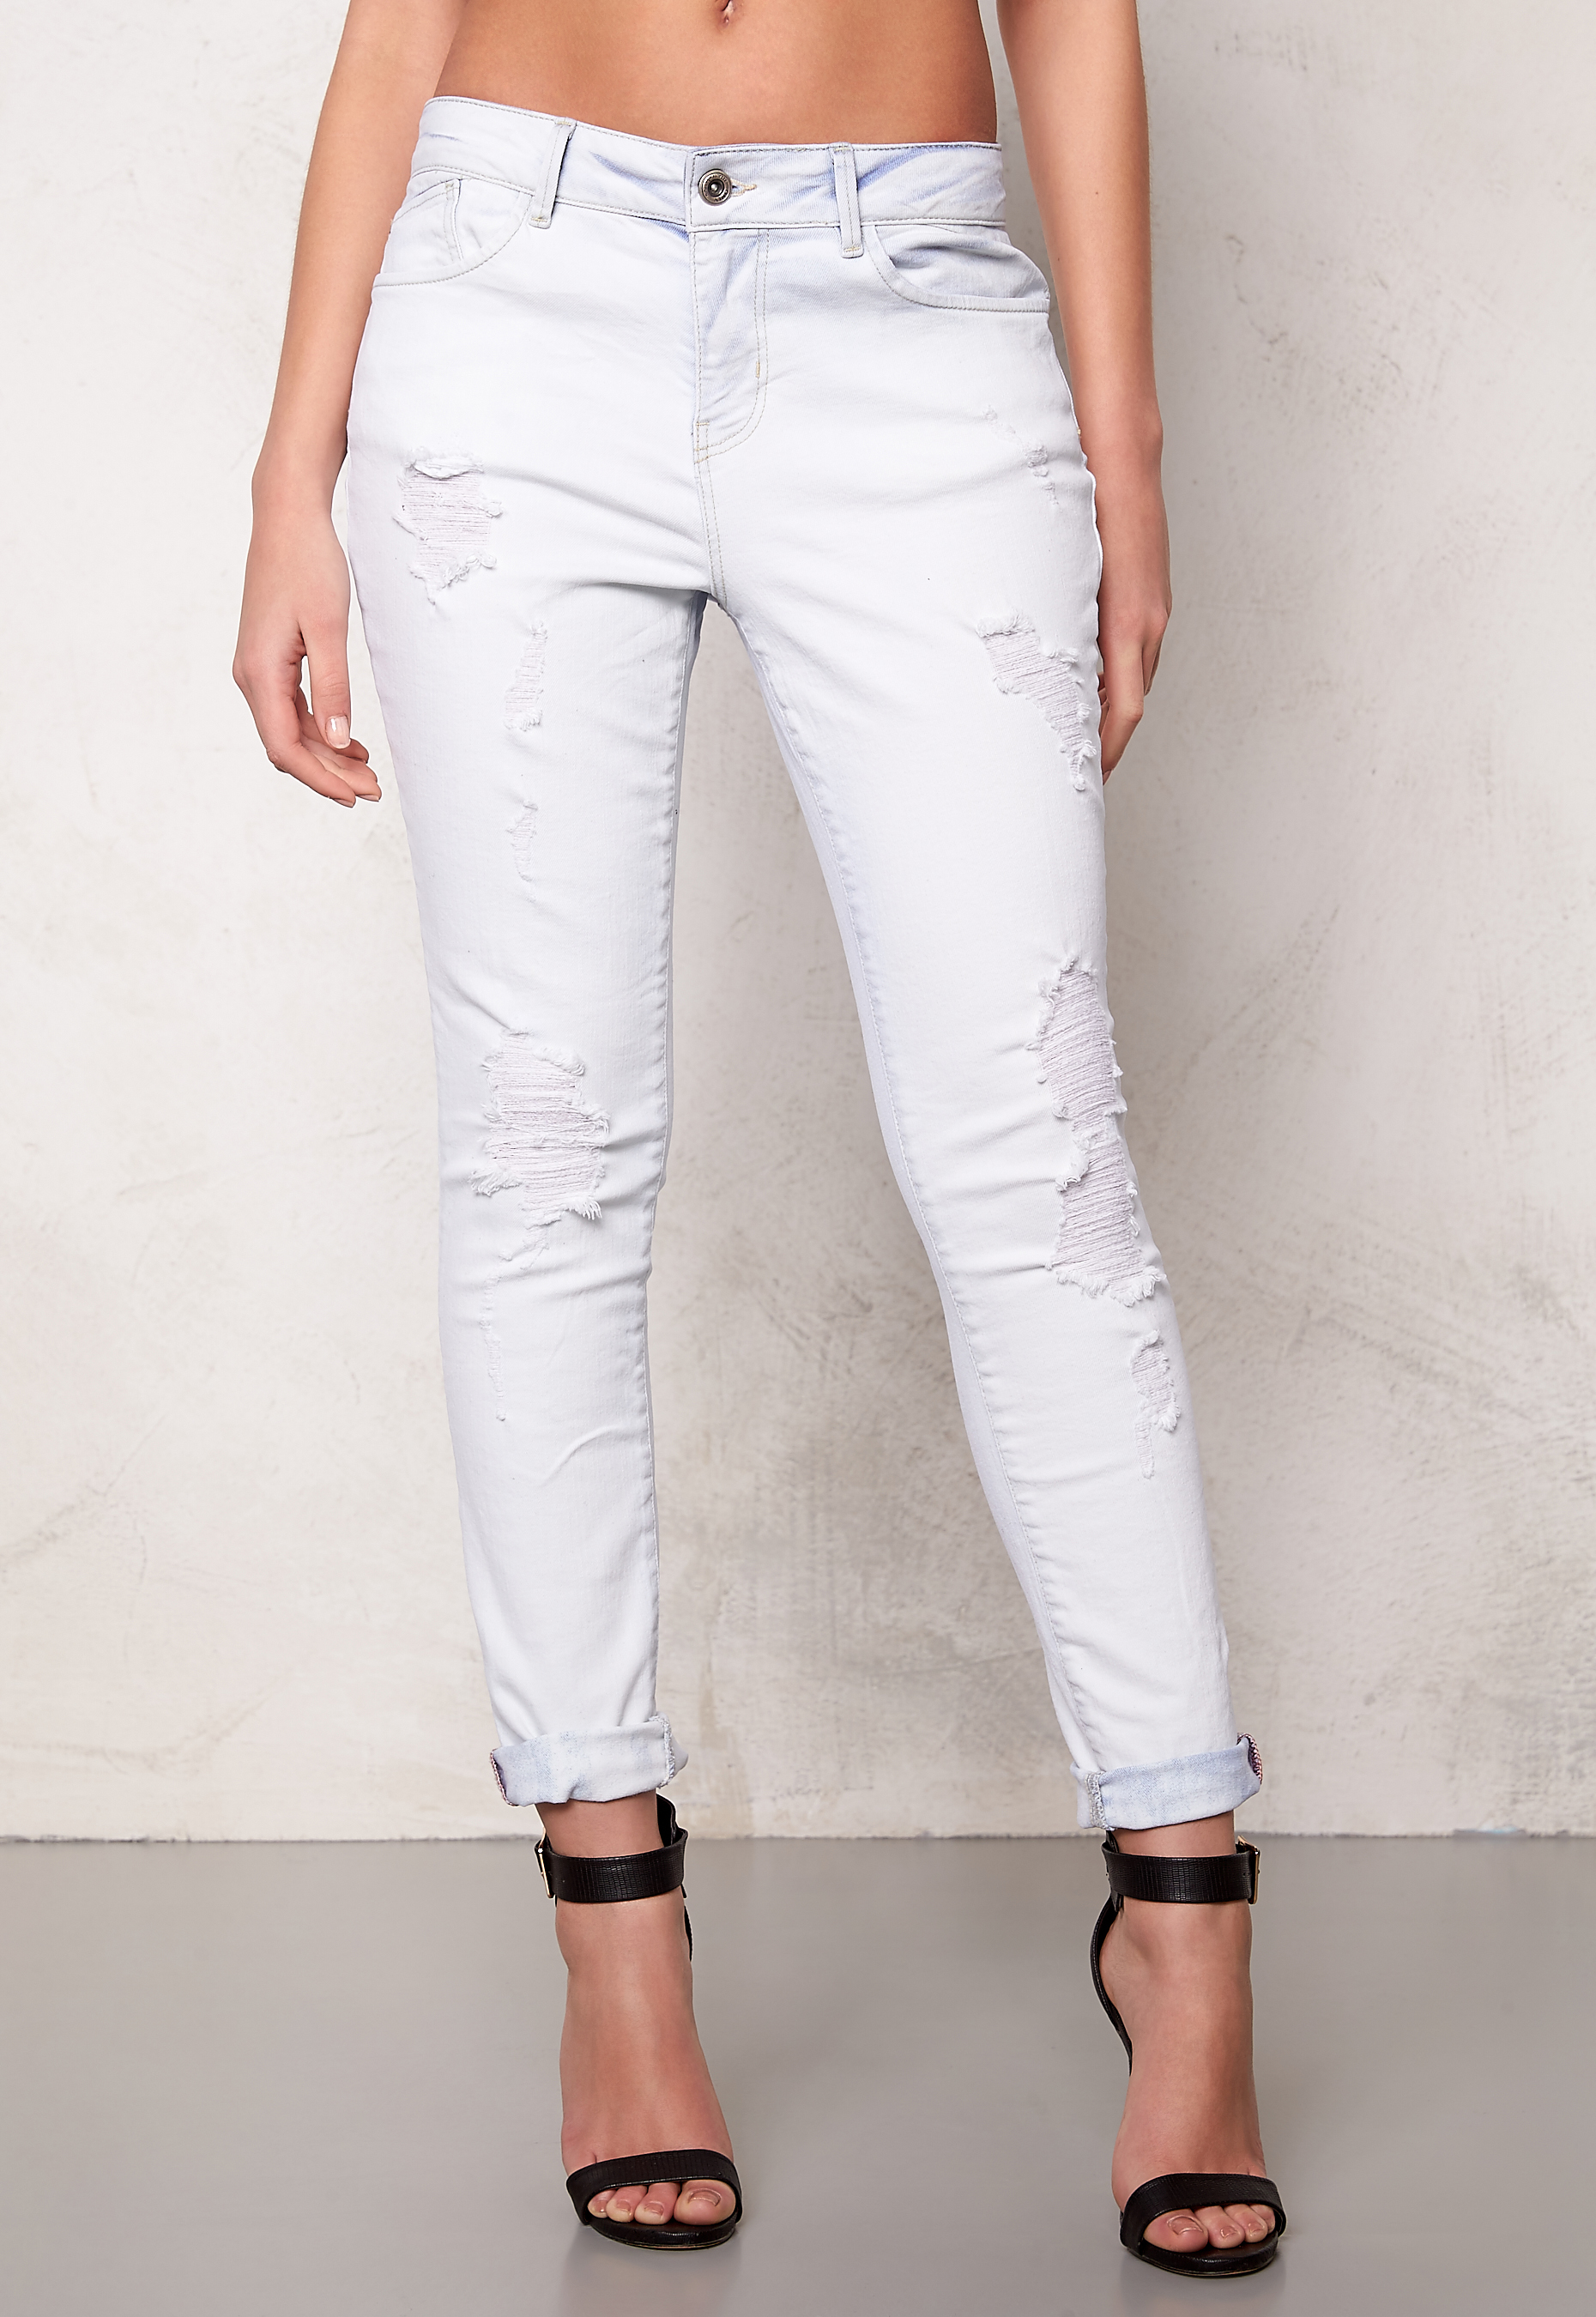 ONLY Lima boyfriend jeans White - Bubbleroom